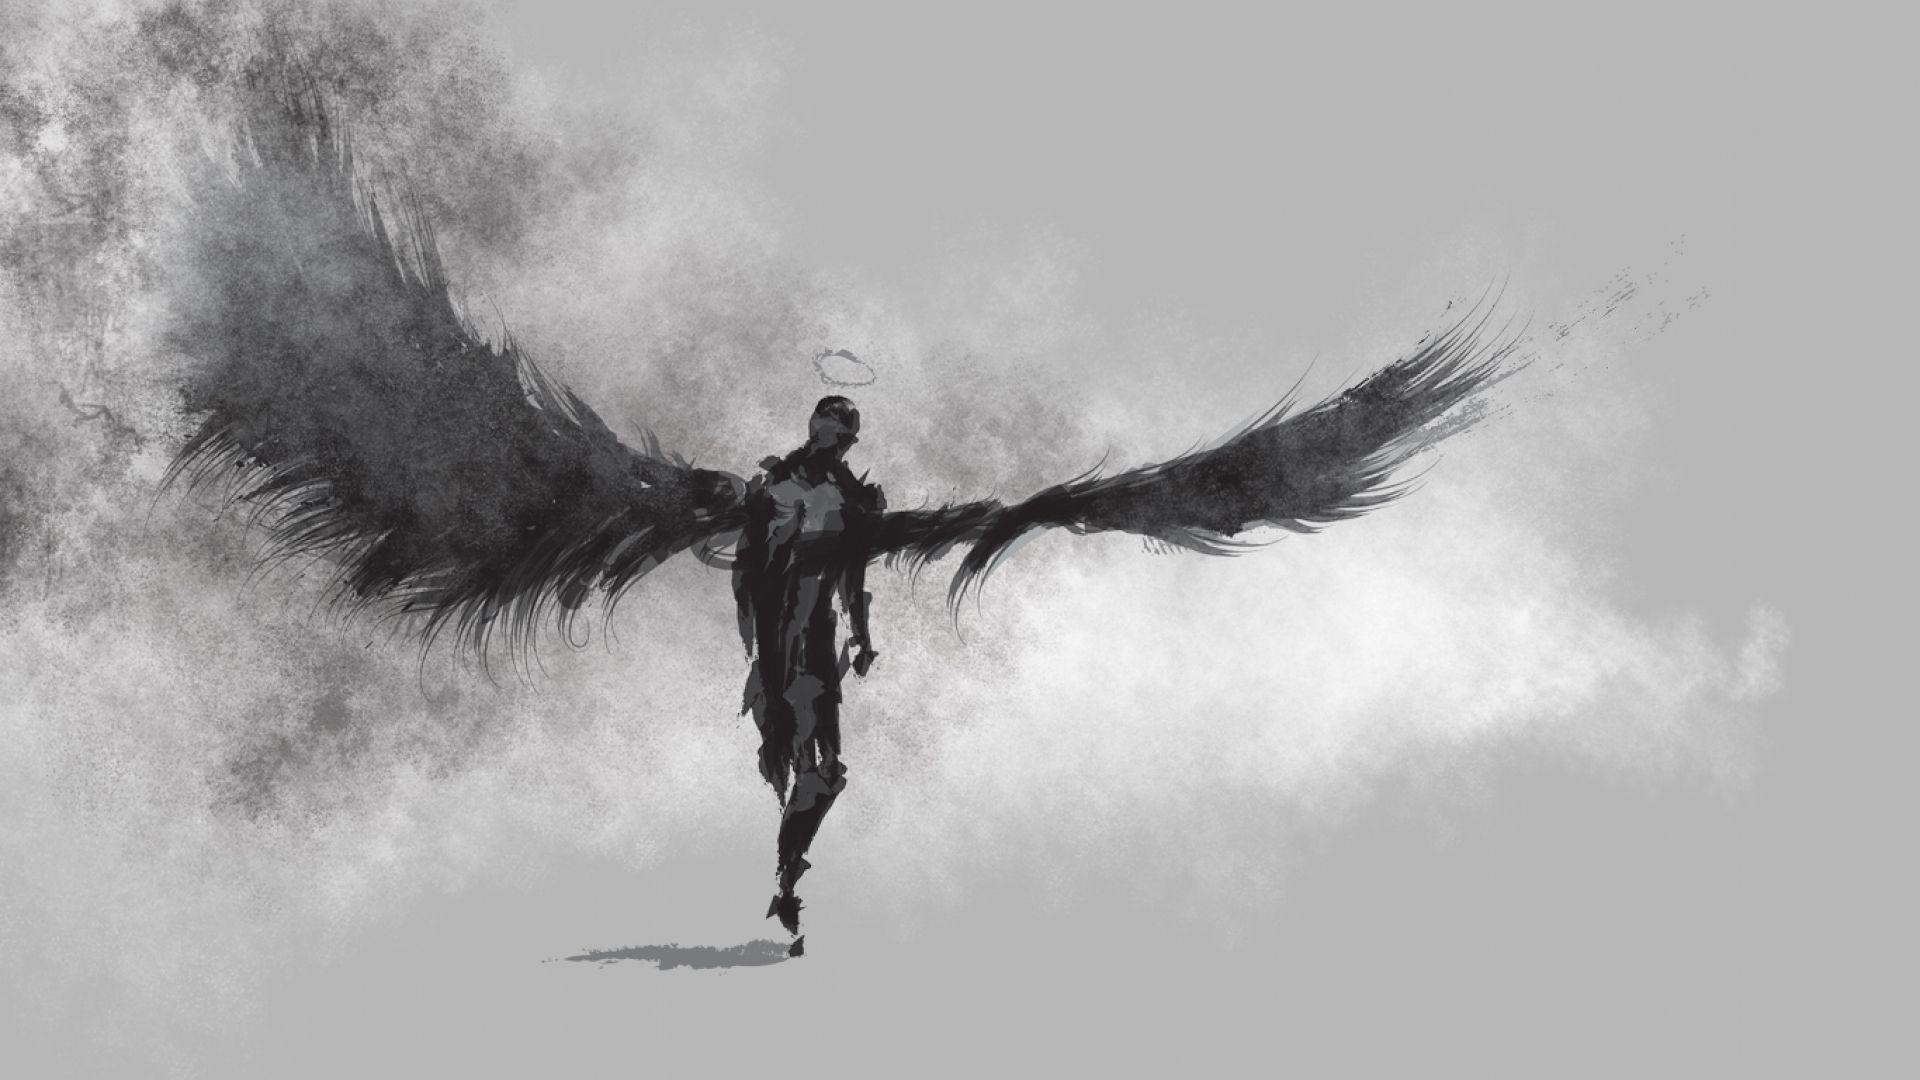 1920x1080 Angel Drawing Wings Bw Gray Grey Hd Wallpaper